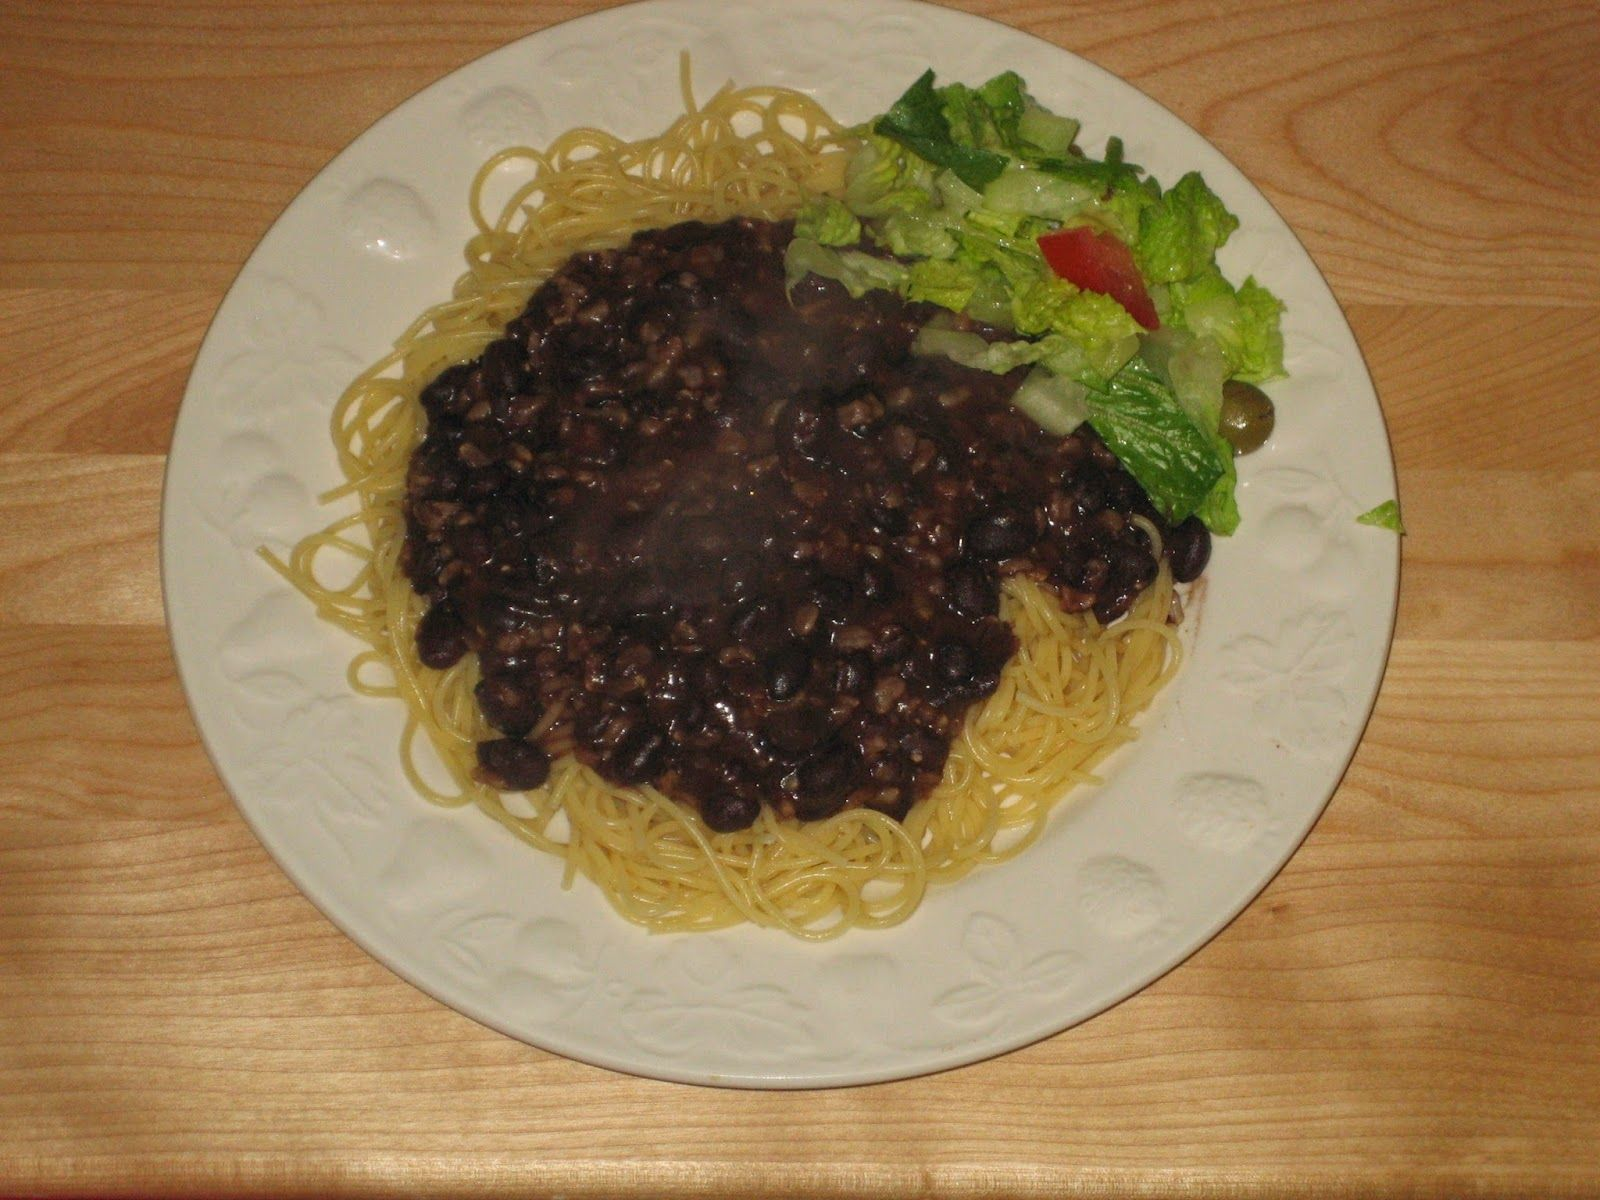 Copycat Skyline Black Beans And Rice Vegetarian Recipes Vegetarian Chili Recipe Black Beans And Rice